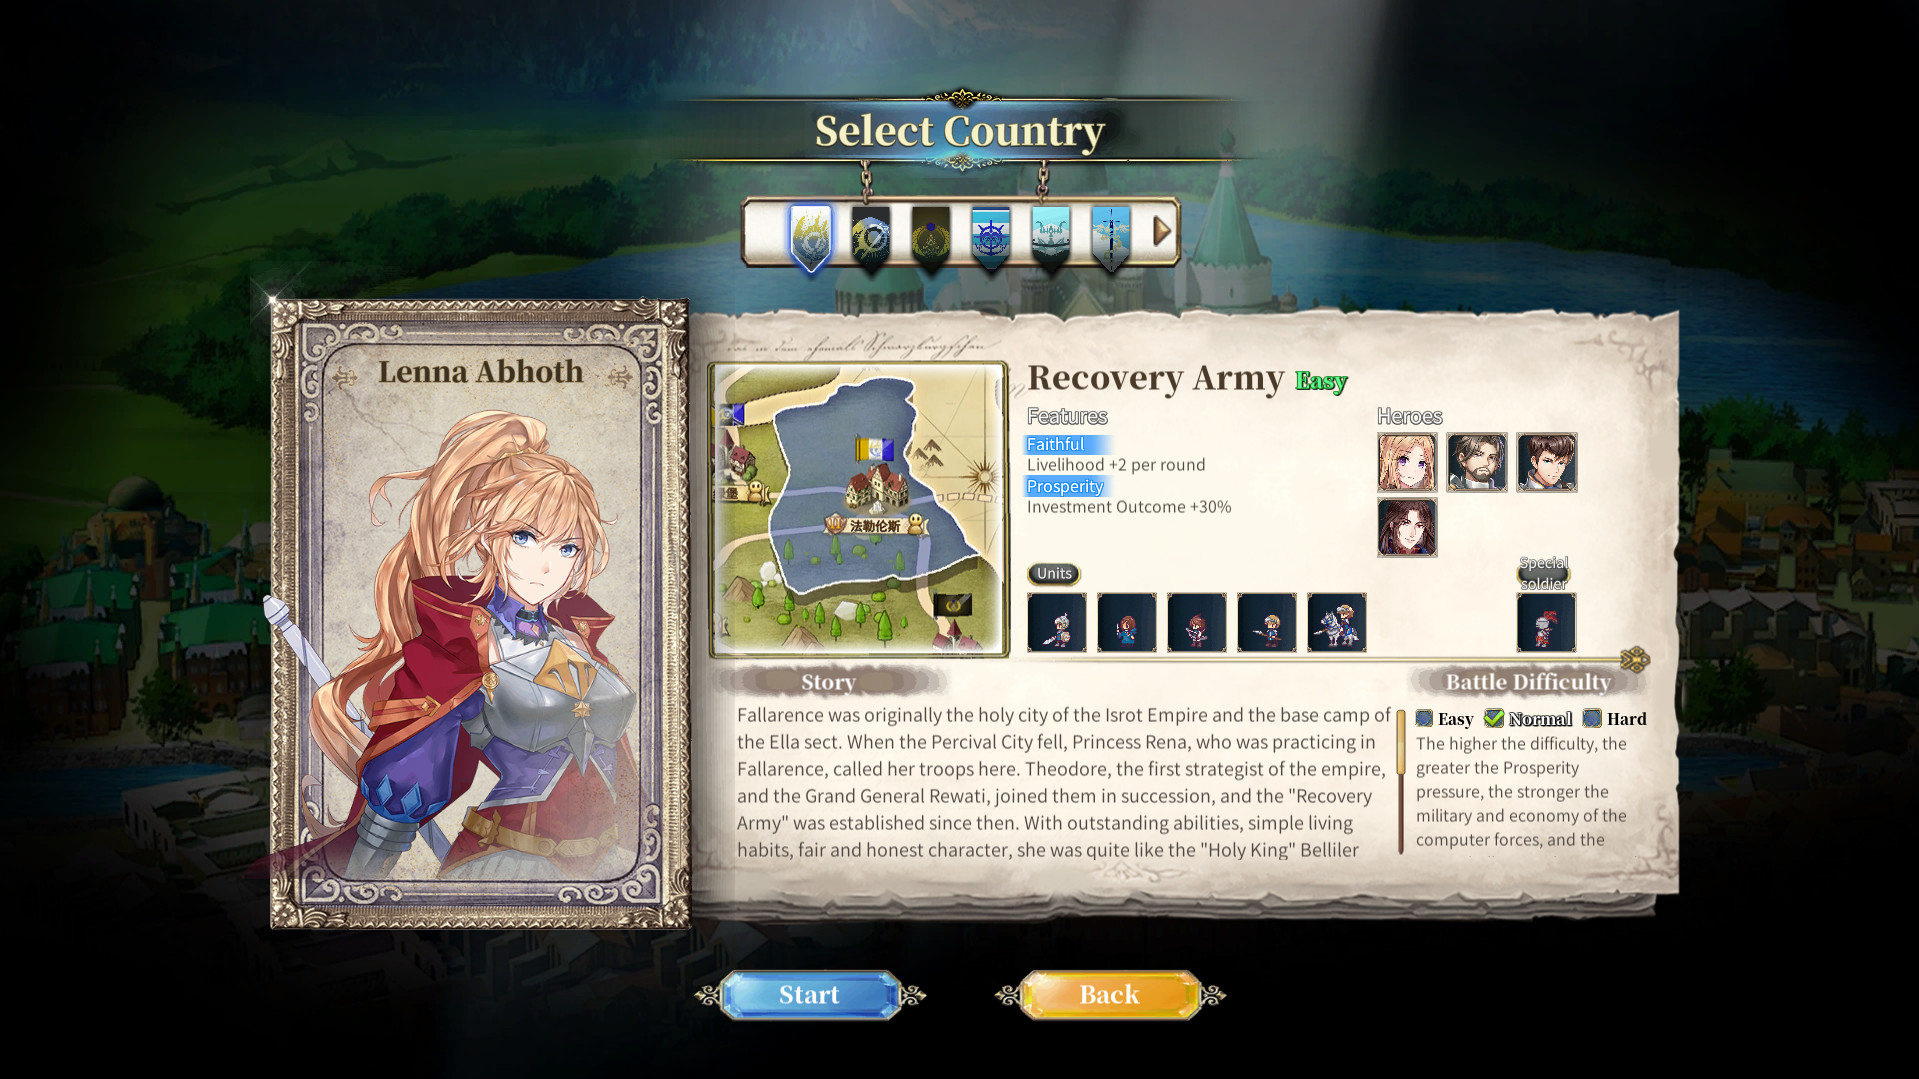 The Heroic Legend of Eagarlnia screenshot